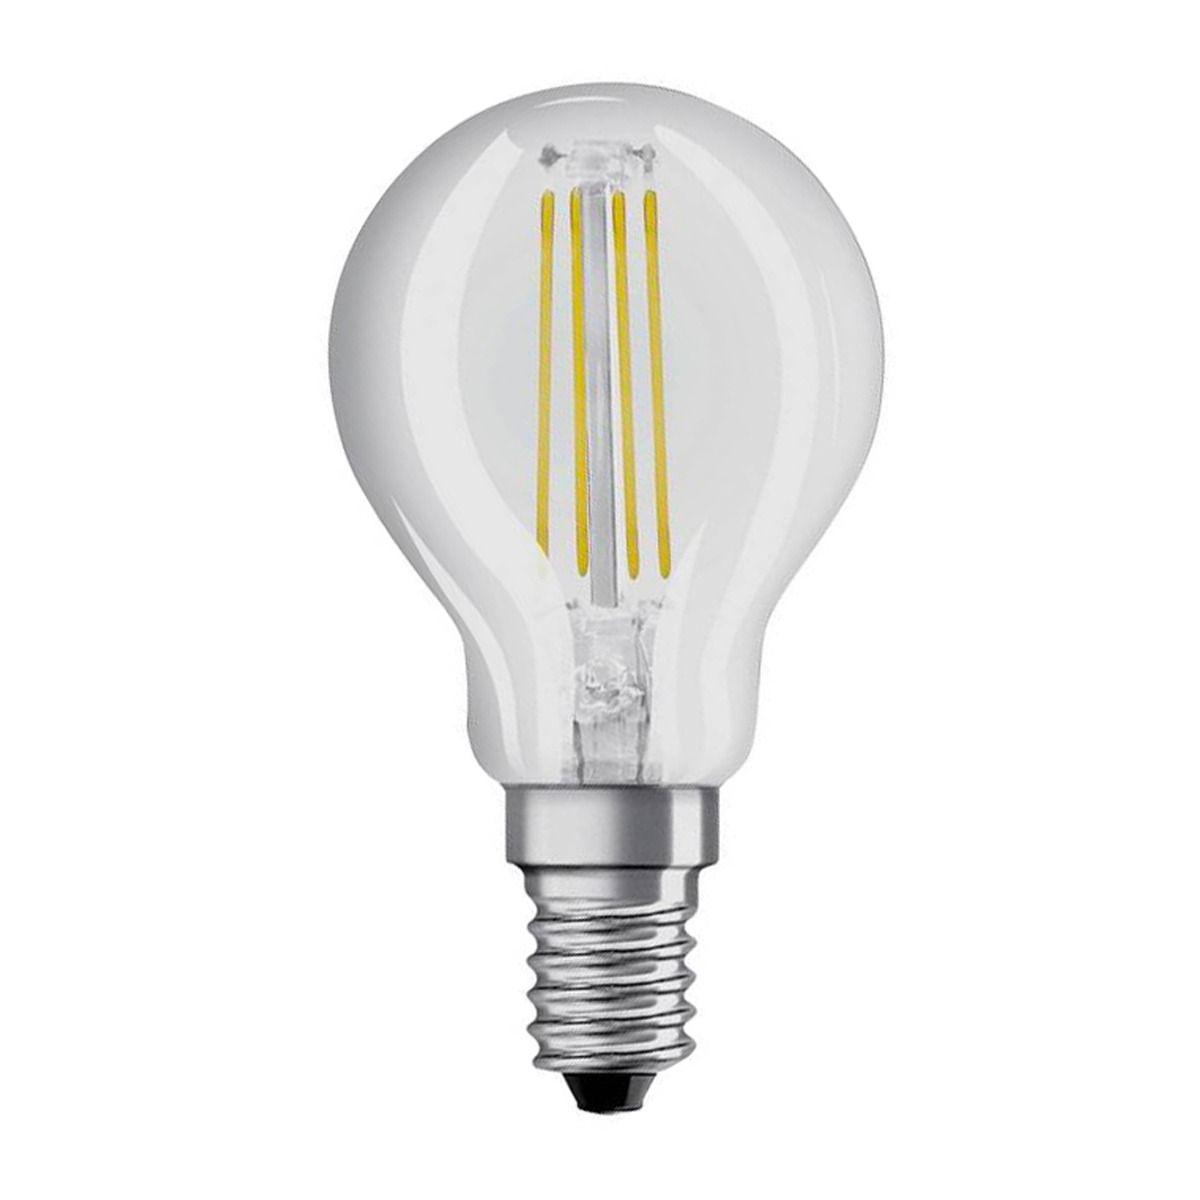 Osram LED Retrofit Klassiek E14 P 4W 840 Helder   Vervangt 40W